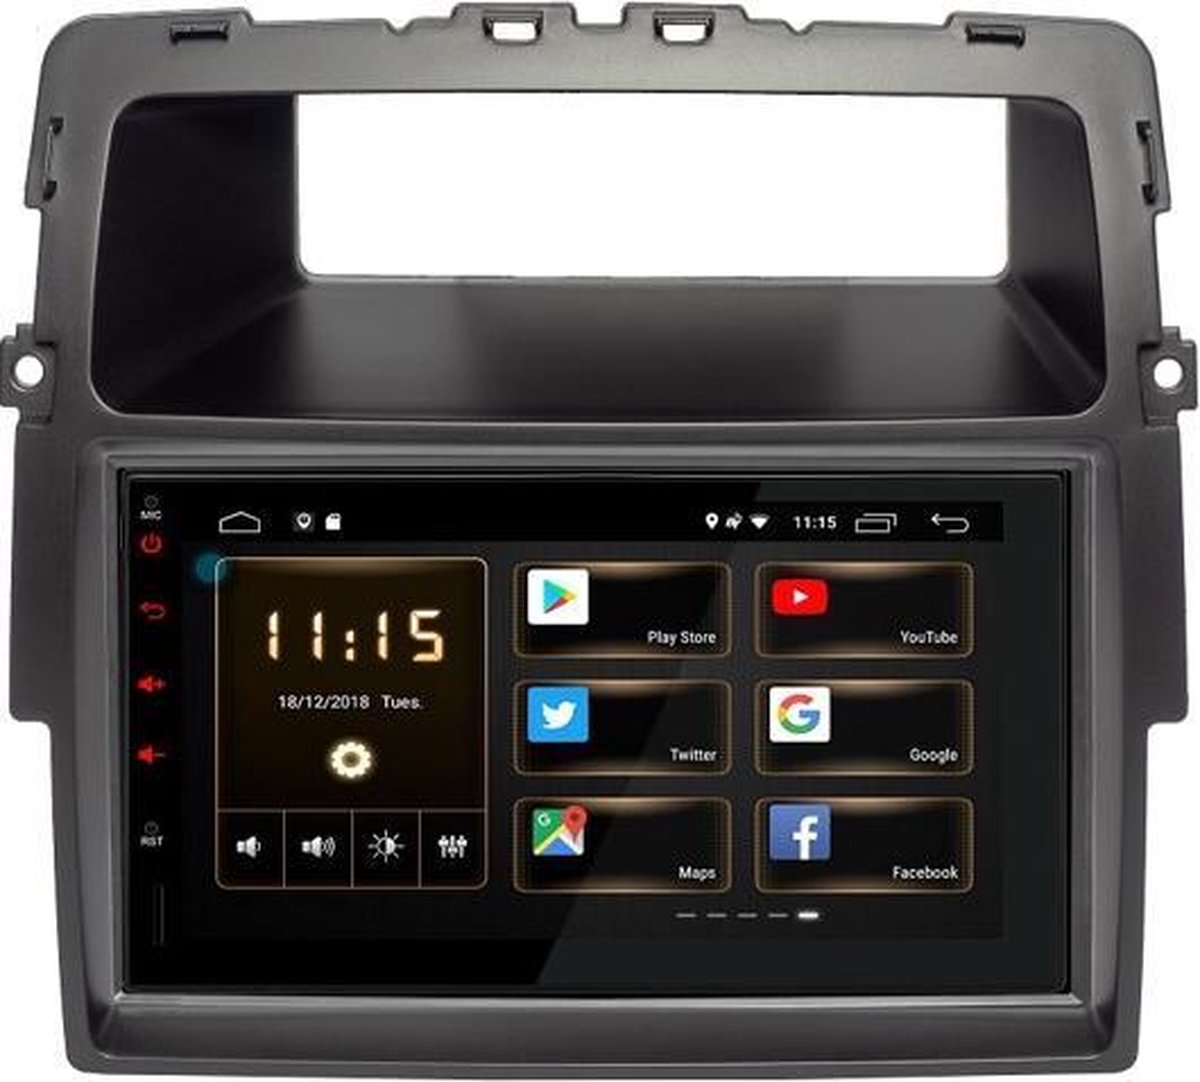 OPEL Vivaro (X83) Android 8.1 navigatie - 7'' touchscreen autoradio